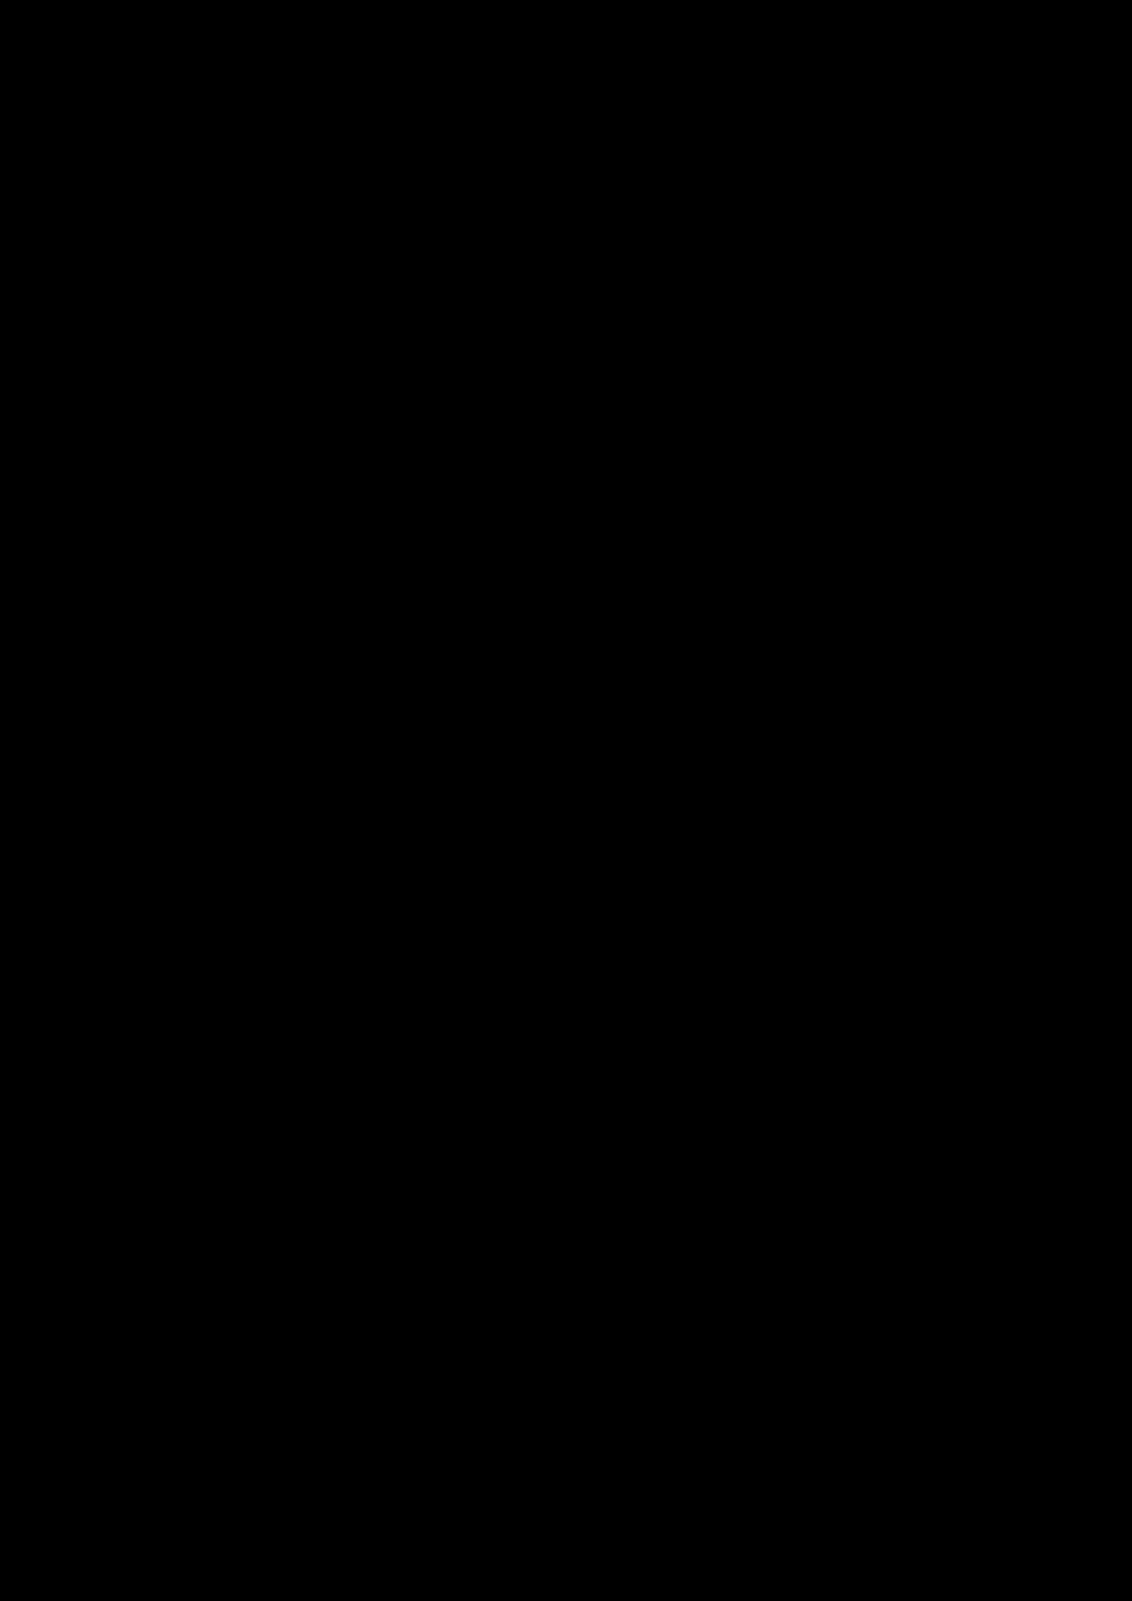 Belyiy sokol slide, Image 77